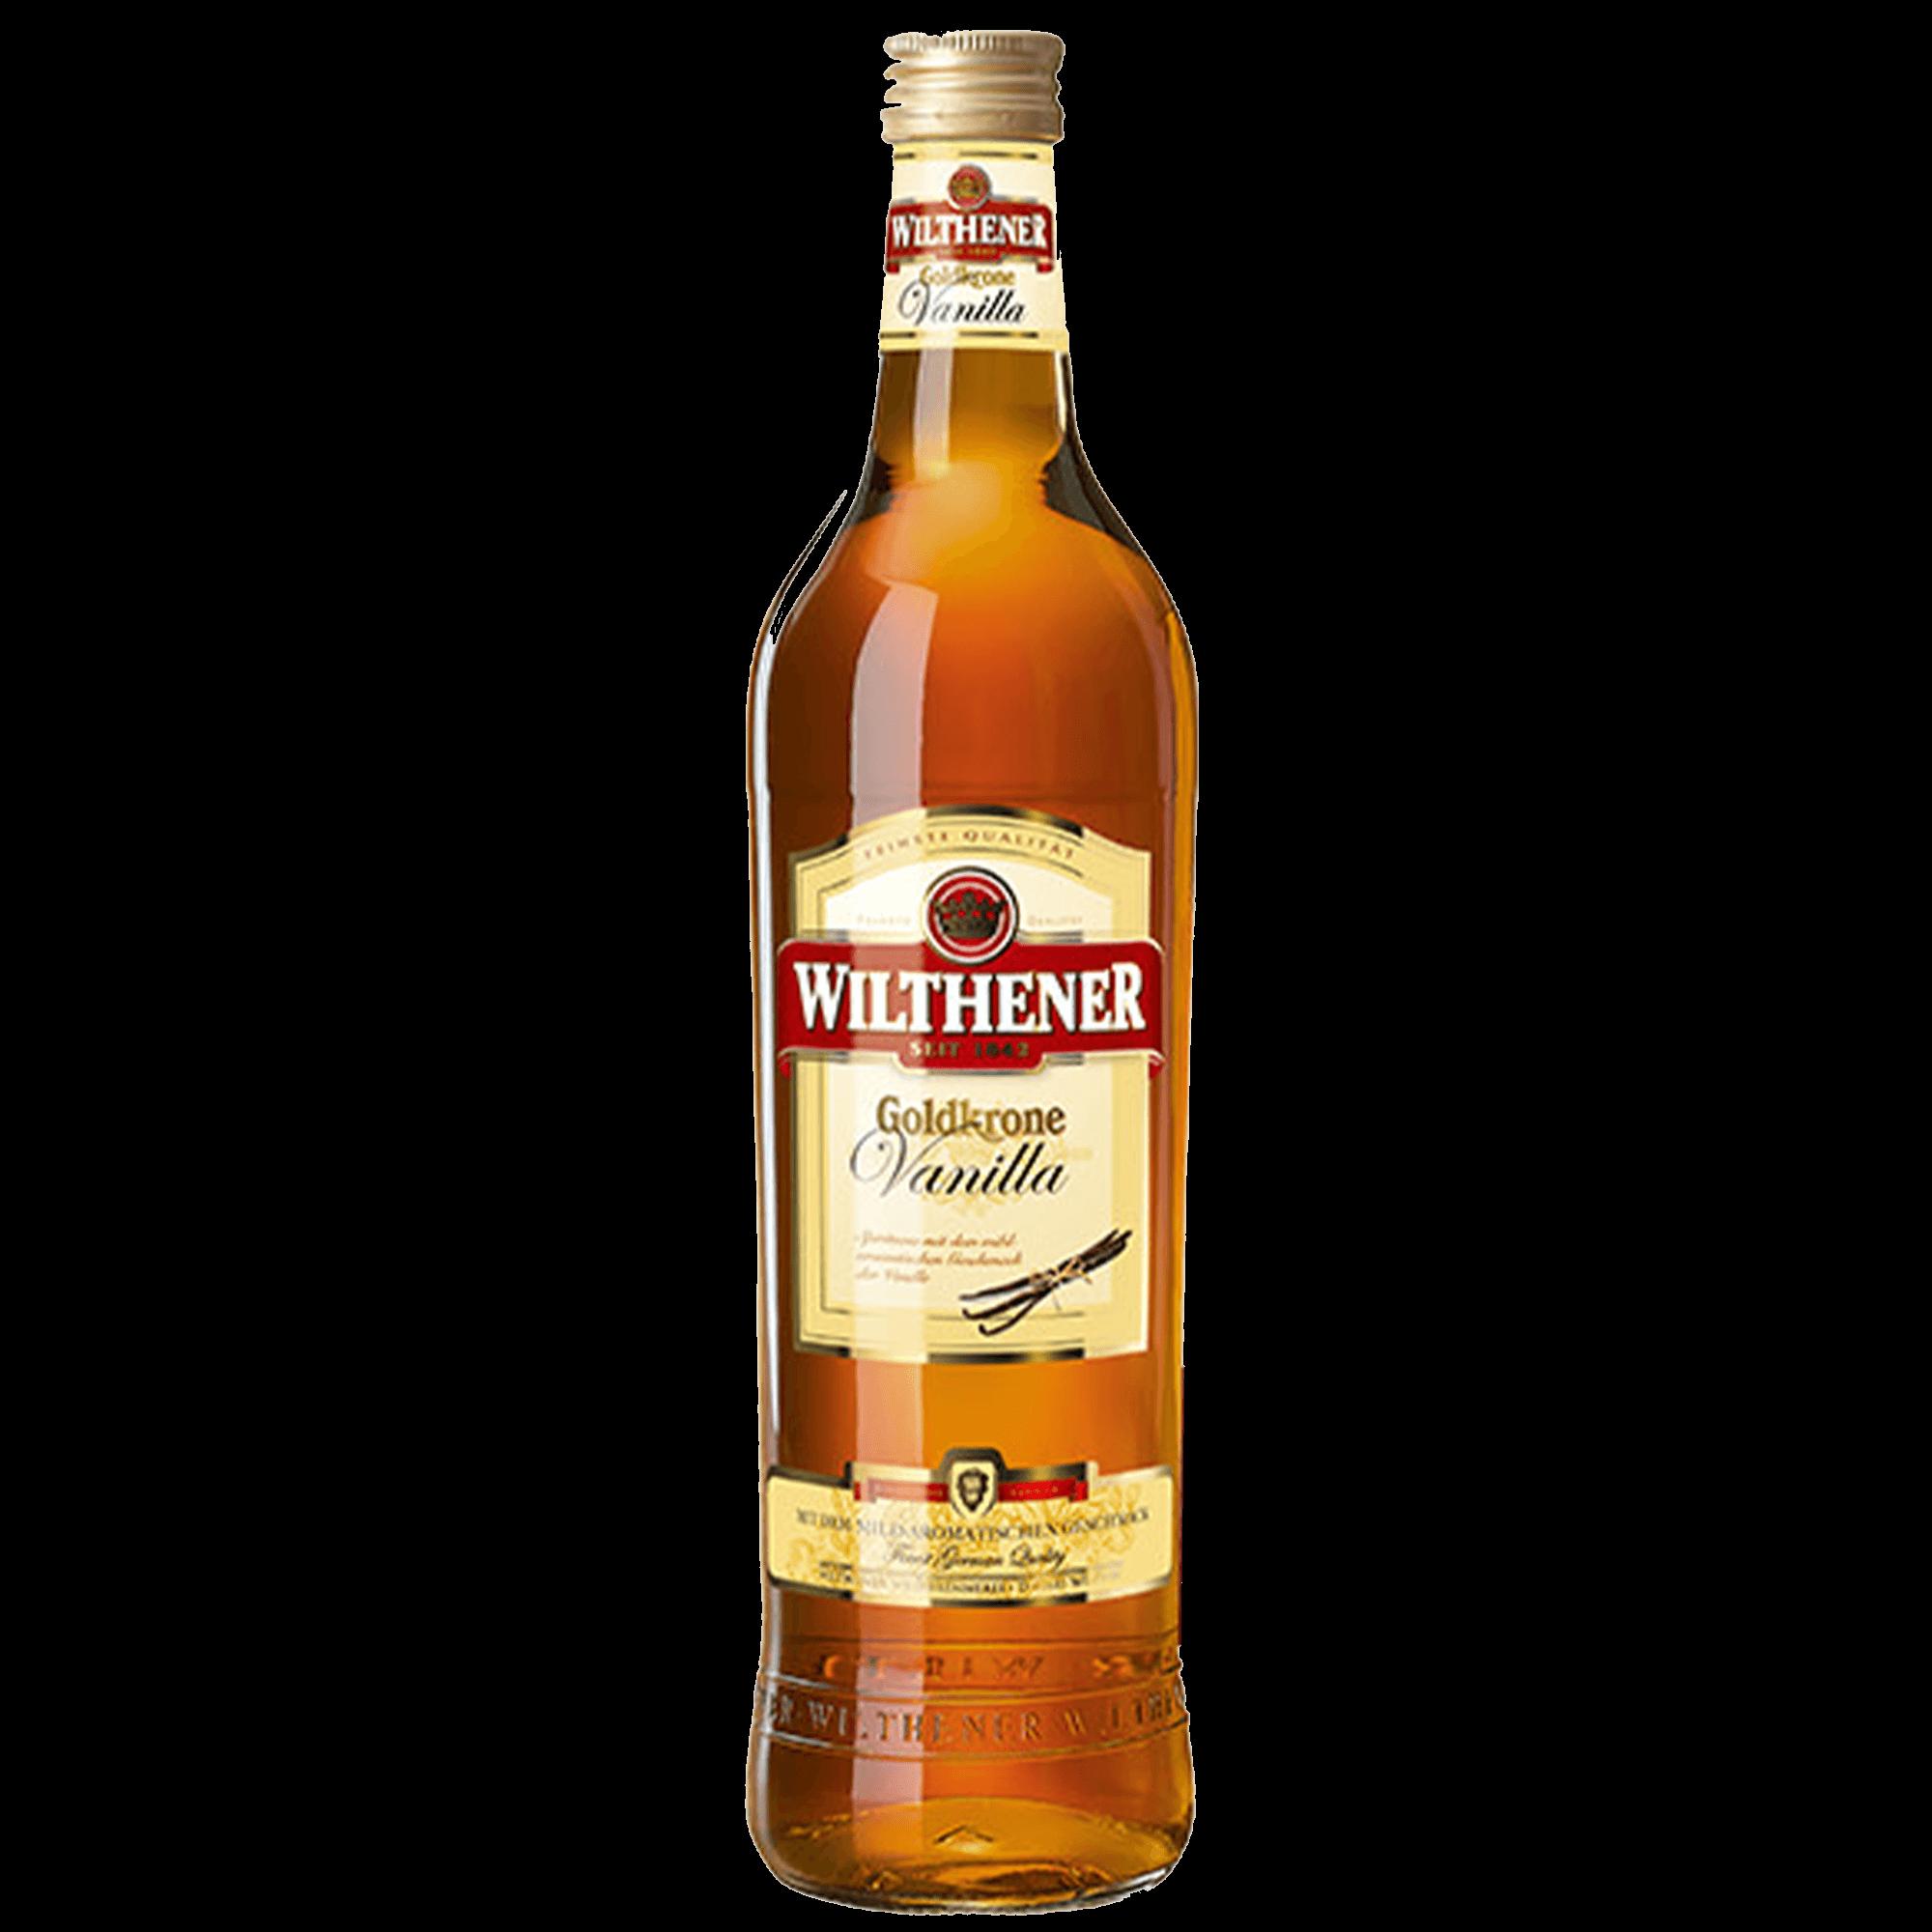 Wilthener Goldkrone Vanilla 0,7l